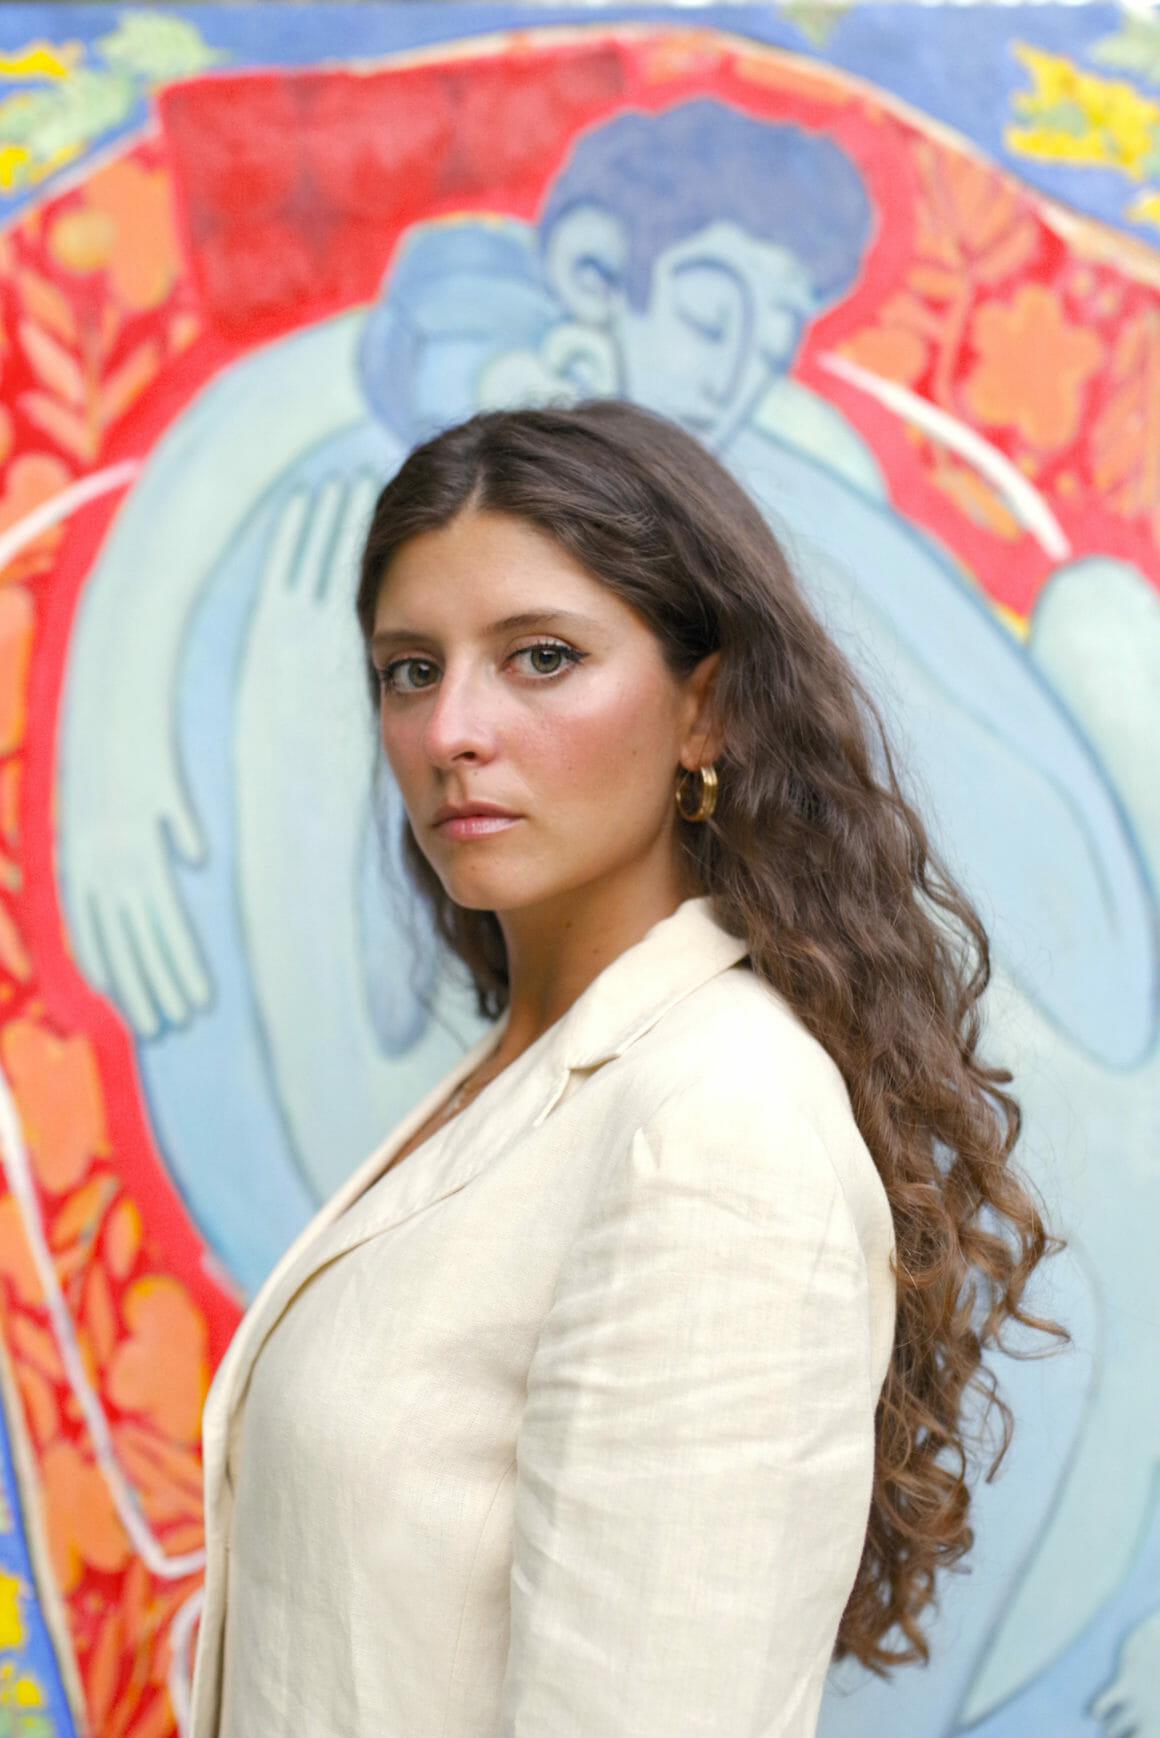 Portrait de l'artiste Miriam Dema